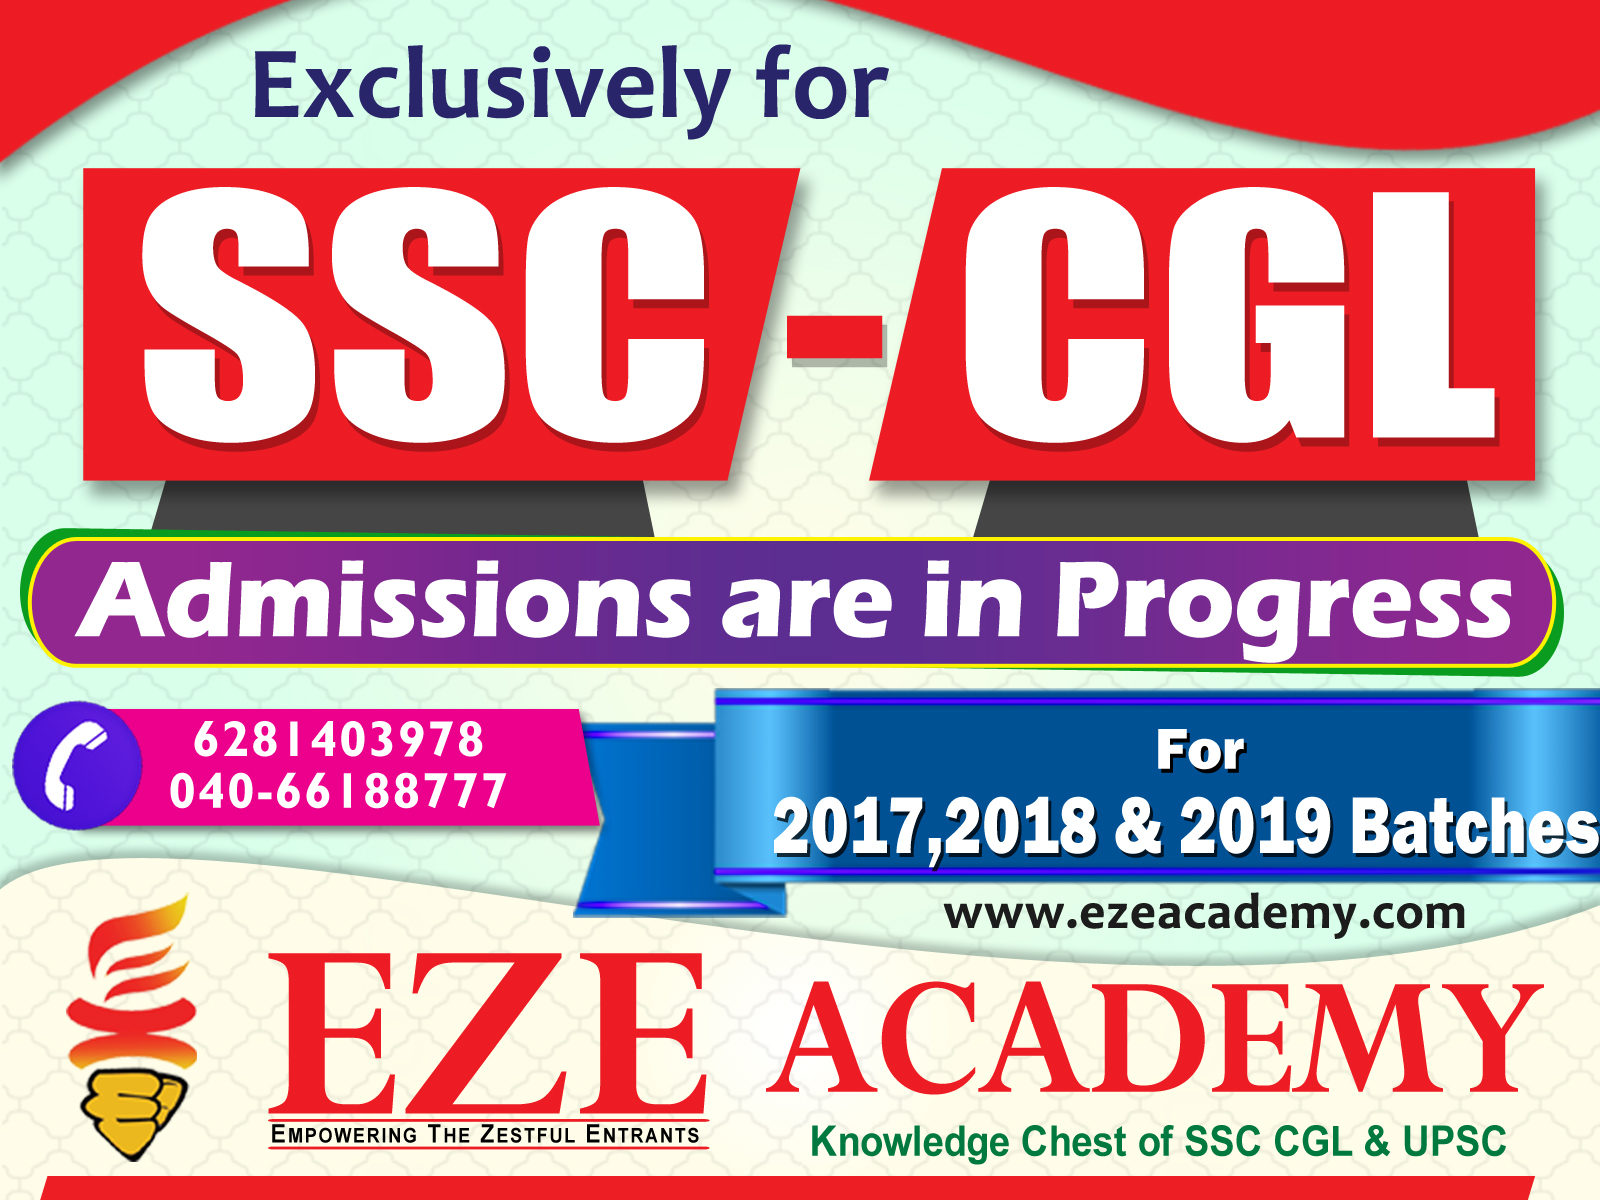 SSC CGL COACHING EZE ACADEMY